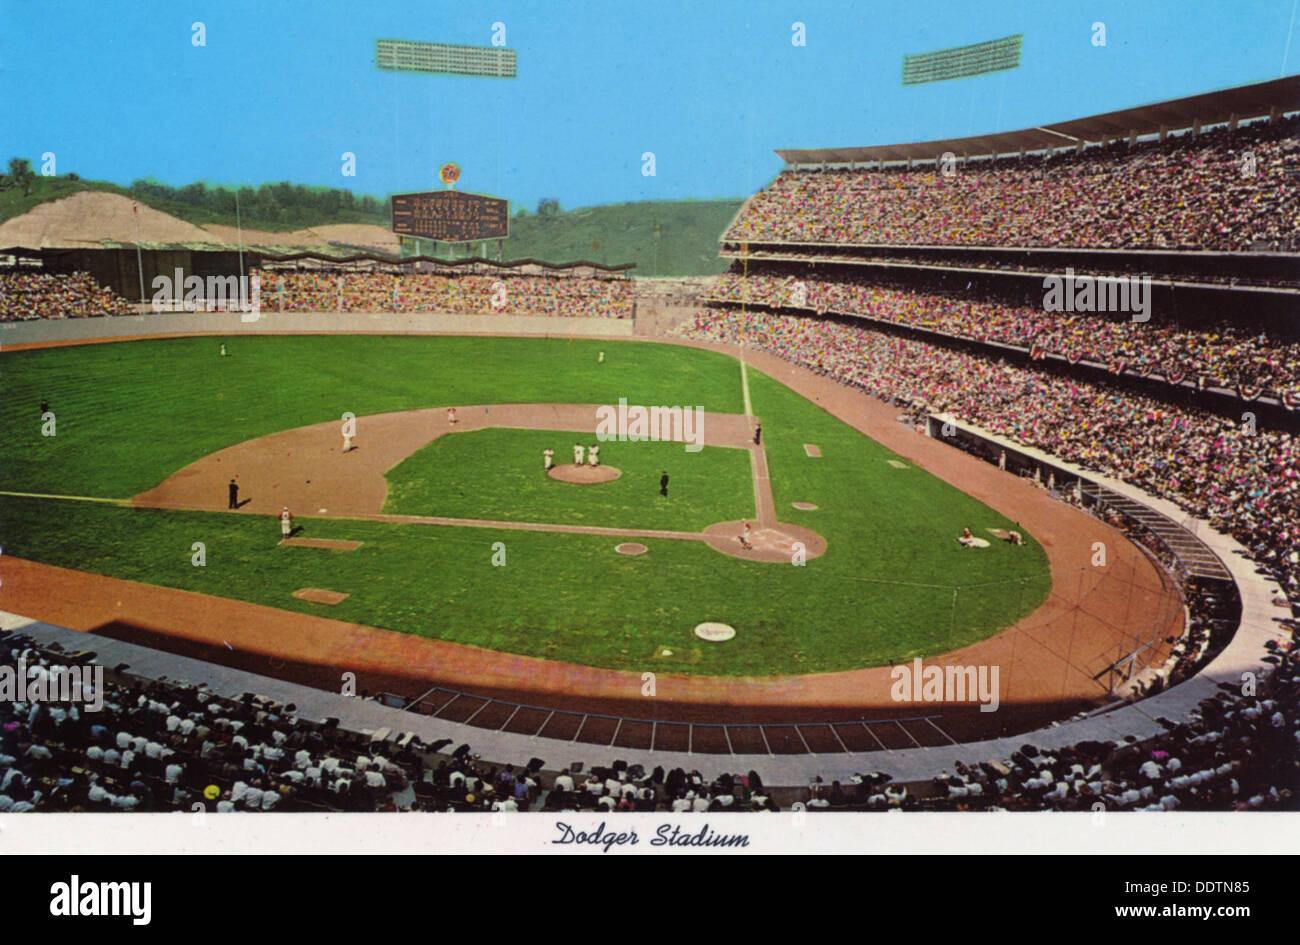 Dodger stadium los angeles california usa 1970 stock photo dodger stadium los angeles california usa 1970 buycottarizona Image collections